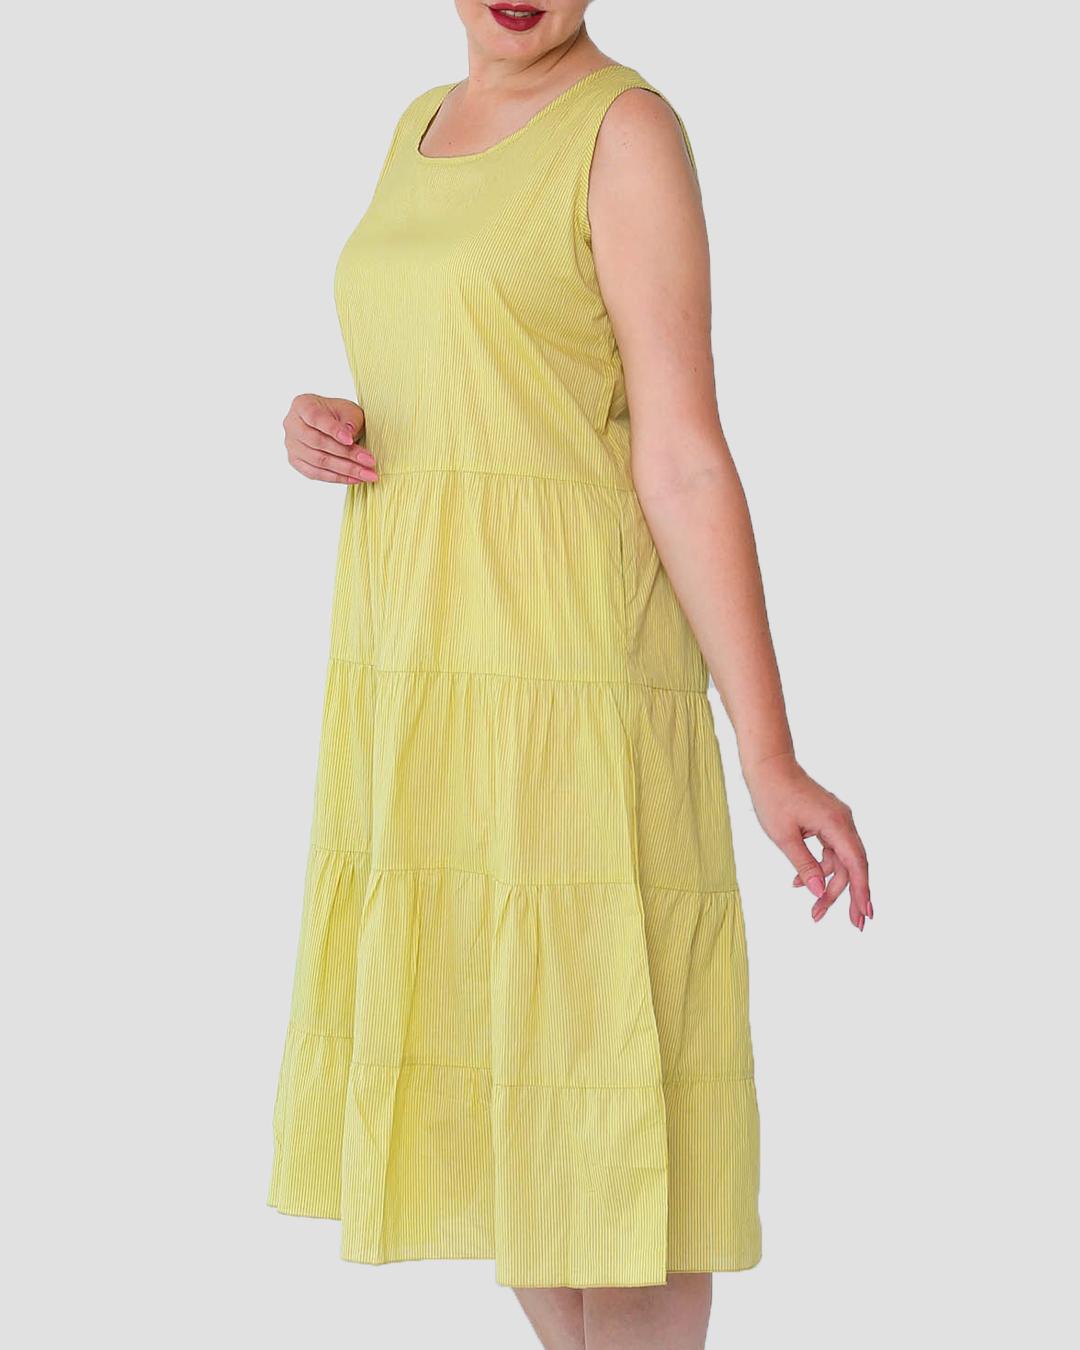 Платье (Сарафан) без рукавов